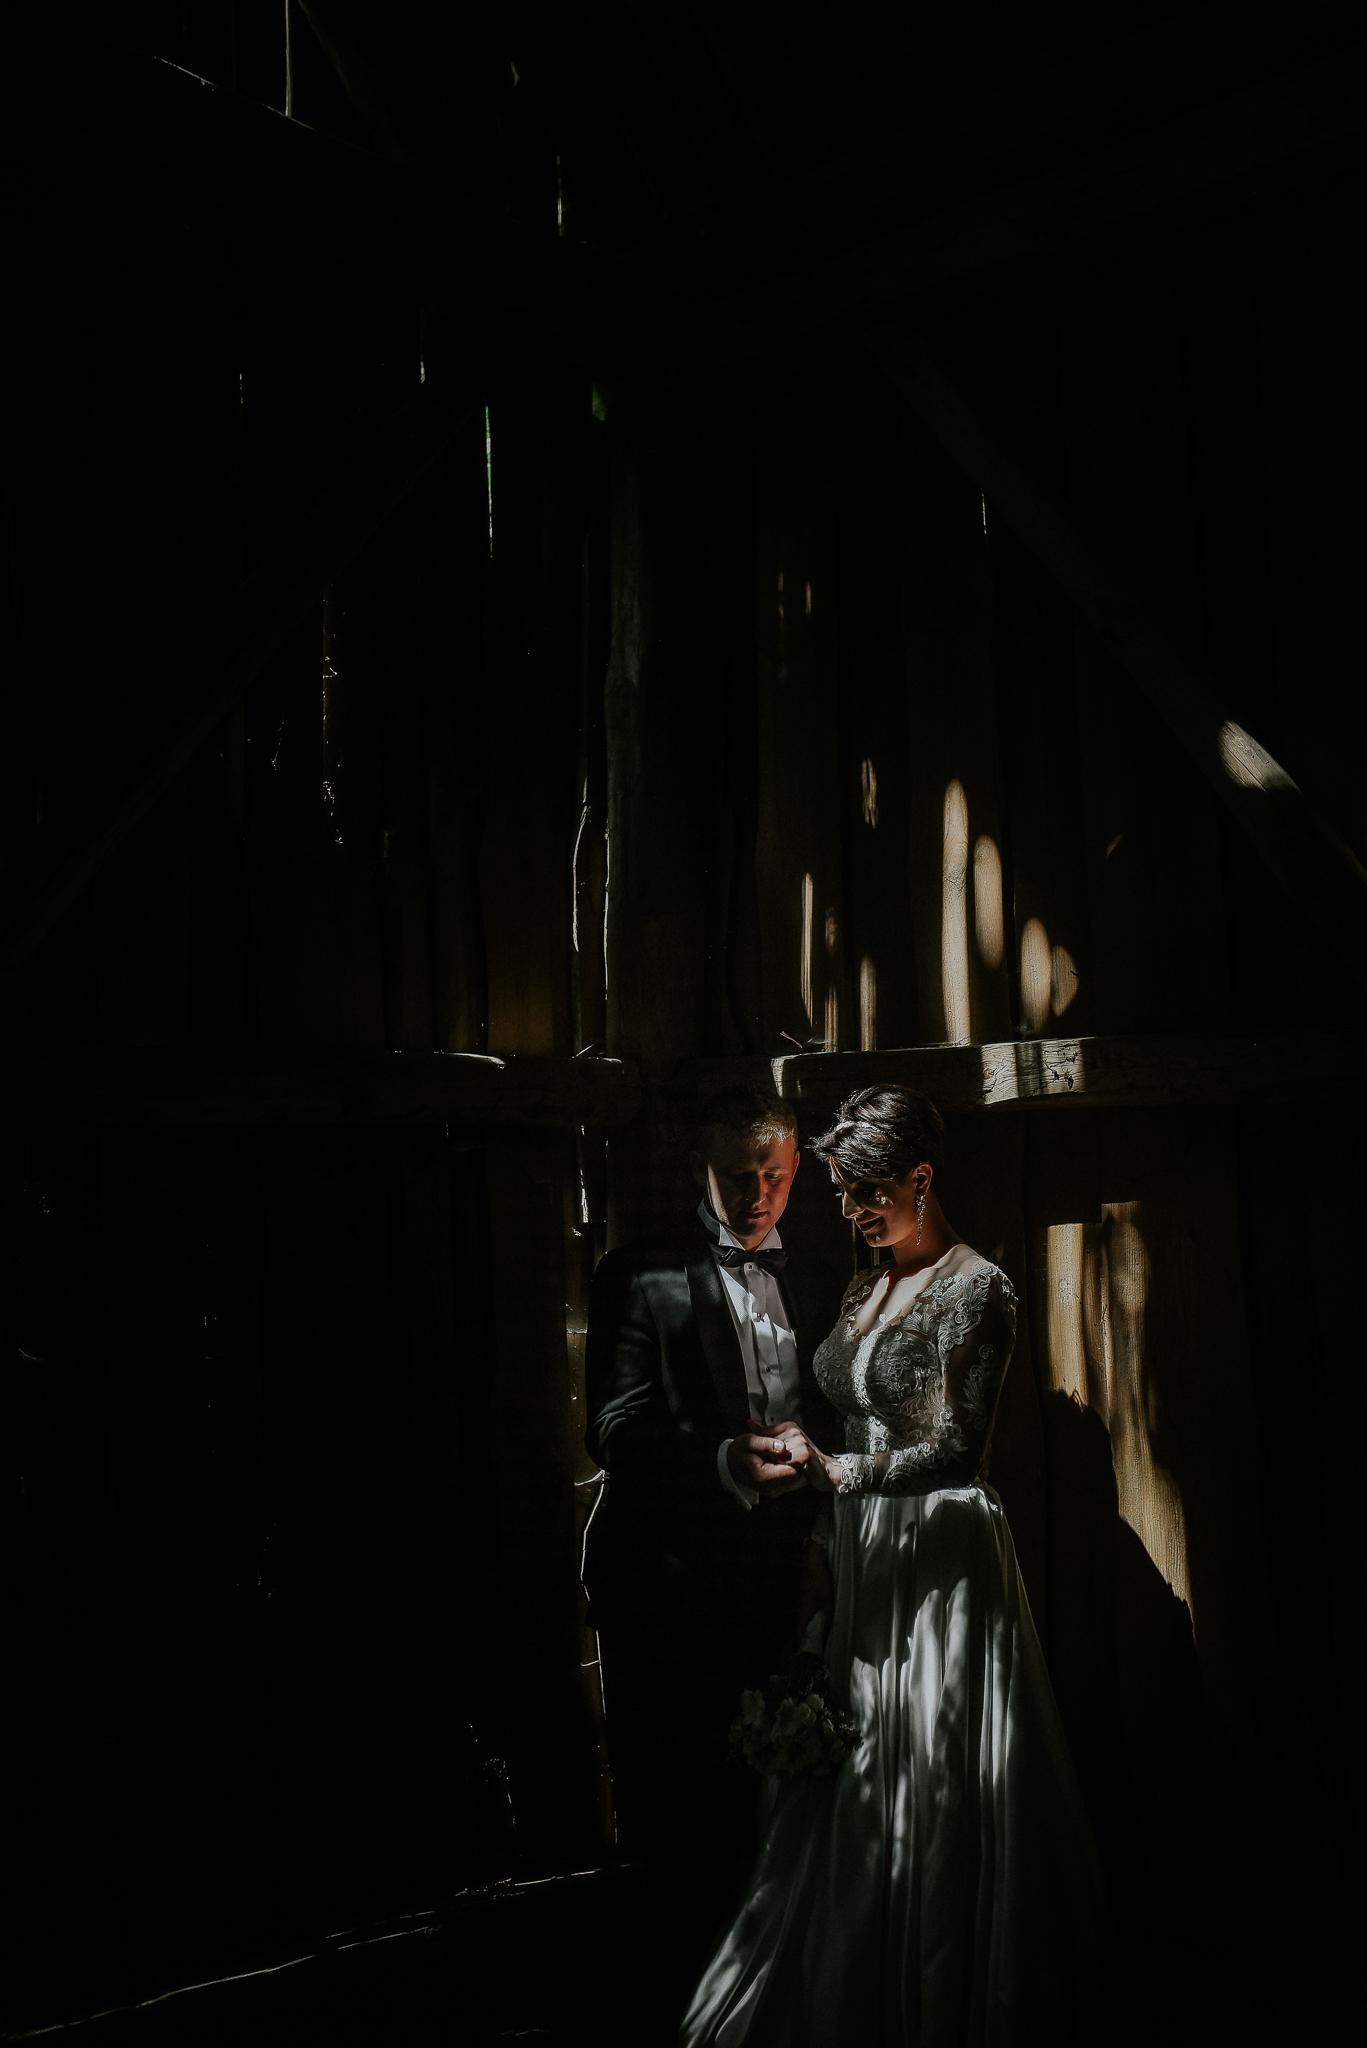 0487_Daria&Szymon__slub_grabow_nad_prosna_wesele_dworek_w_grabowie__fotografia_slubna_________www_amfoto_pl_AMF_8694.jpg